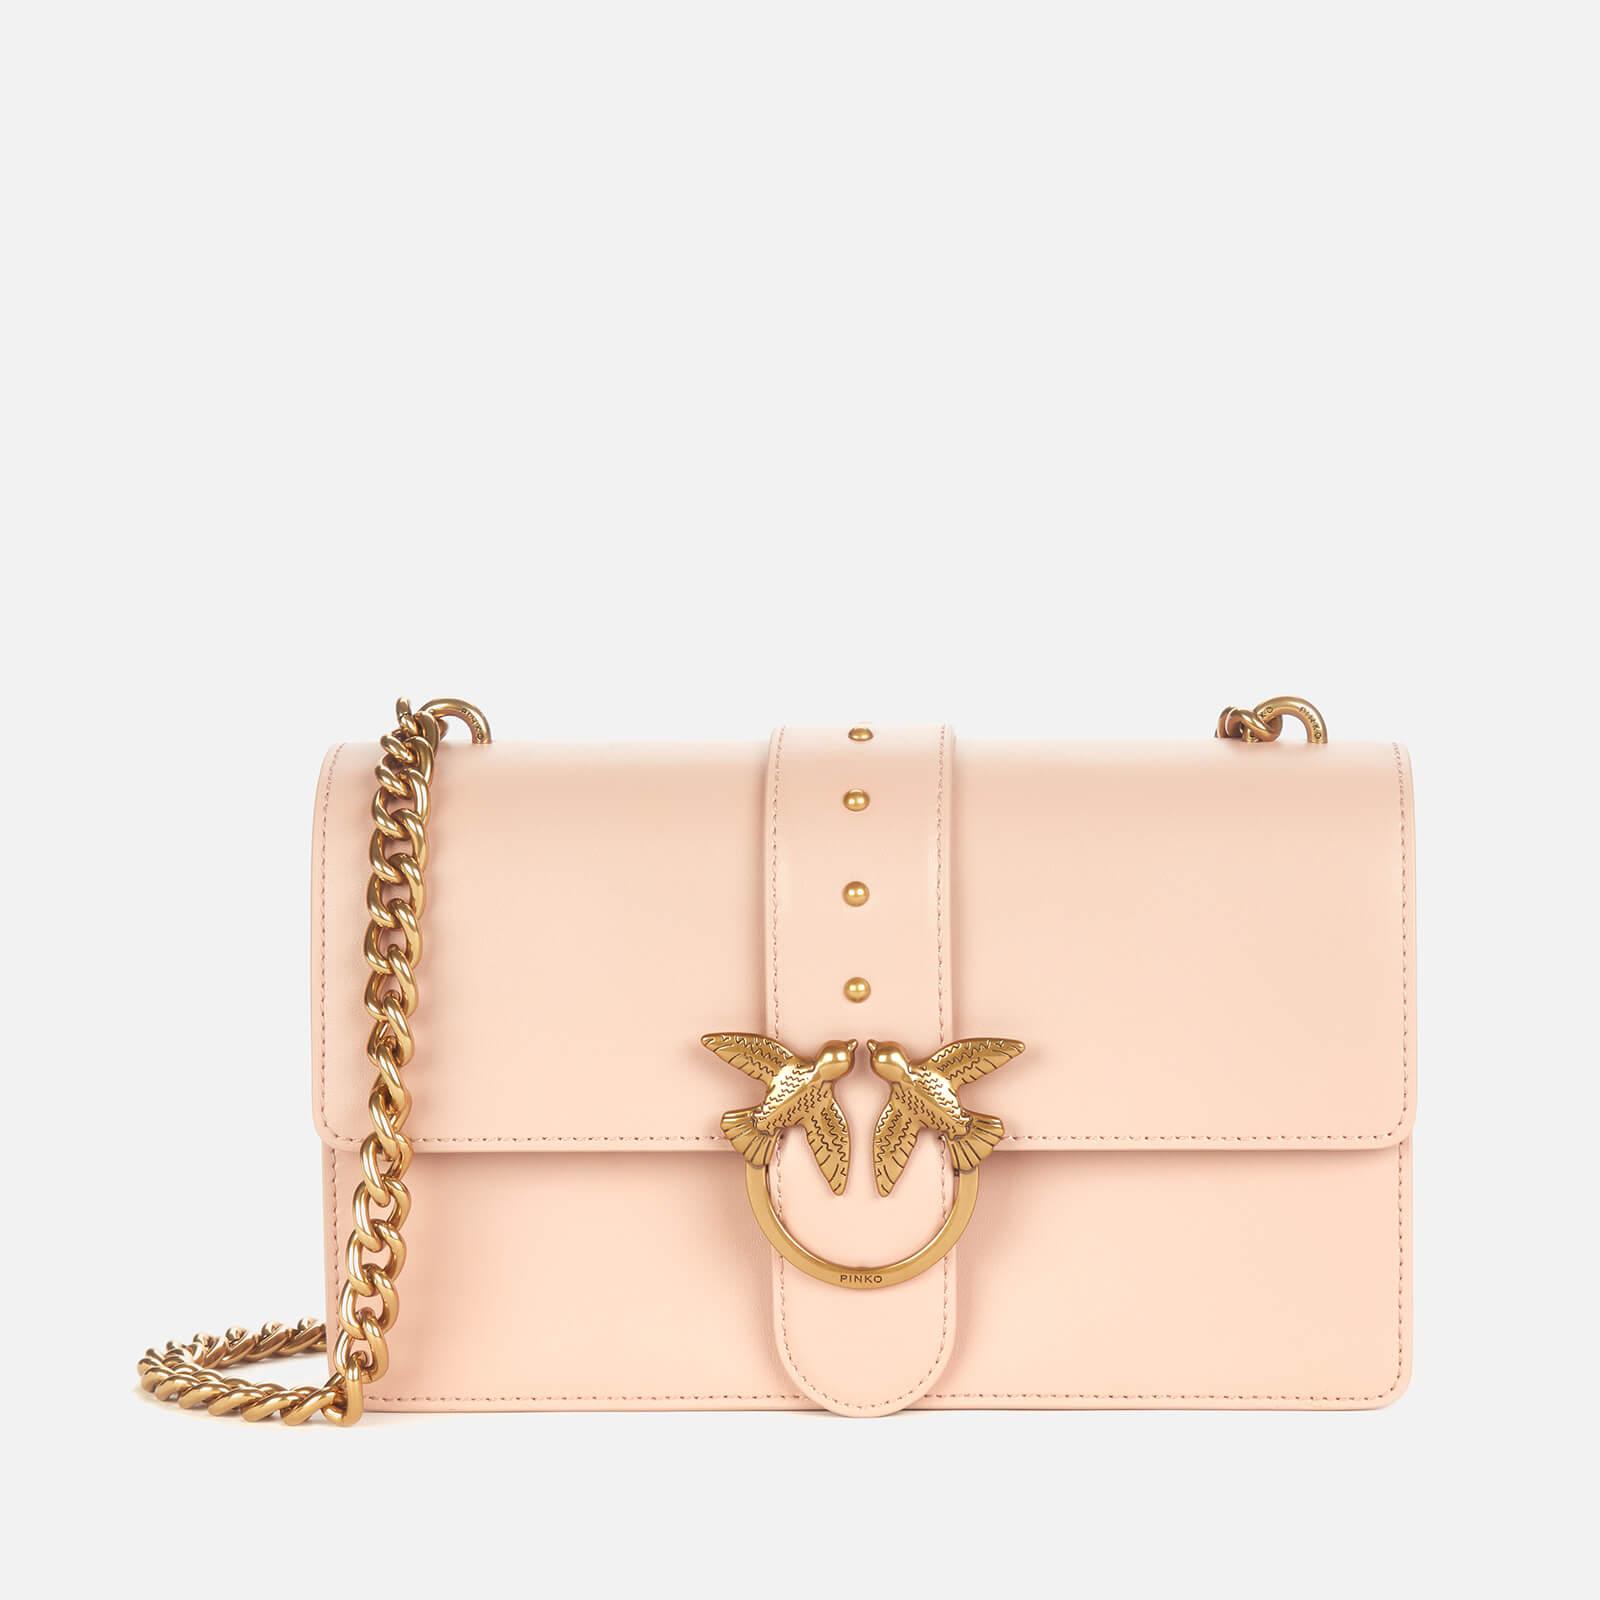 pinko women's love classic icon simply bag - powder pink